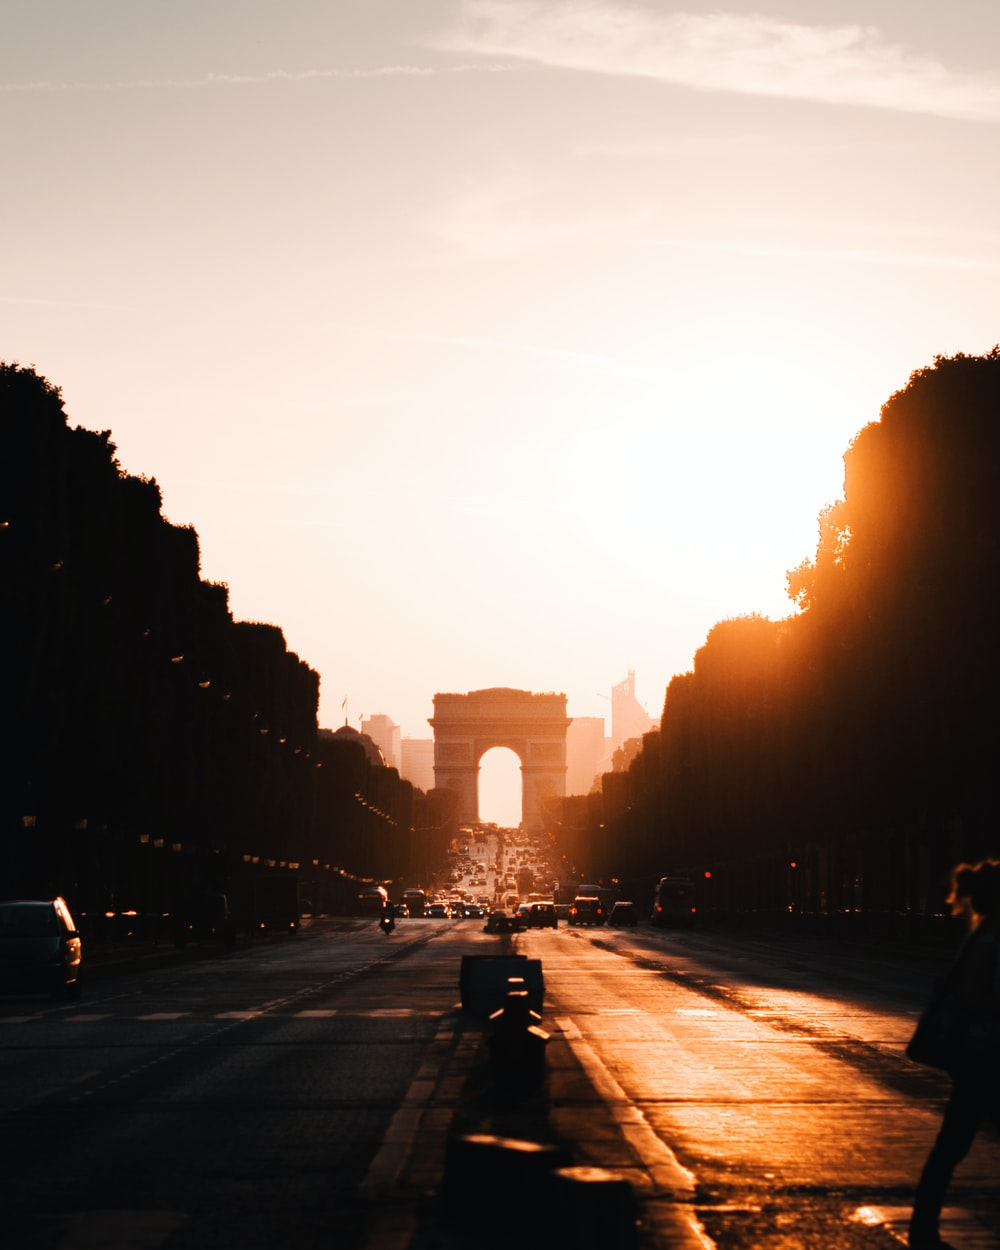 people walking on road during sunset